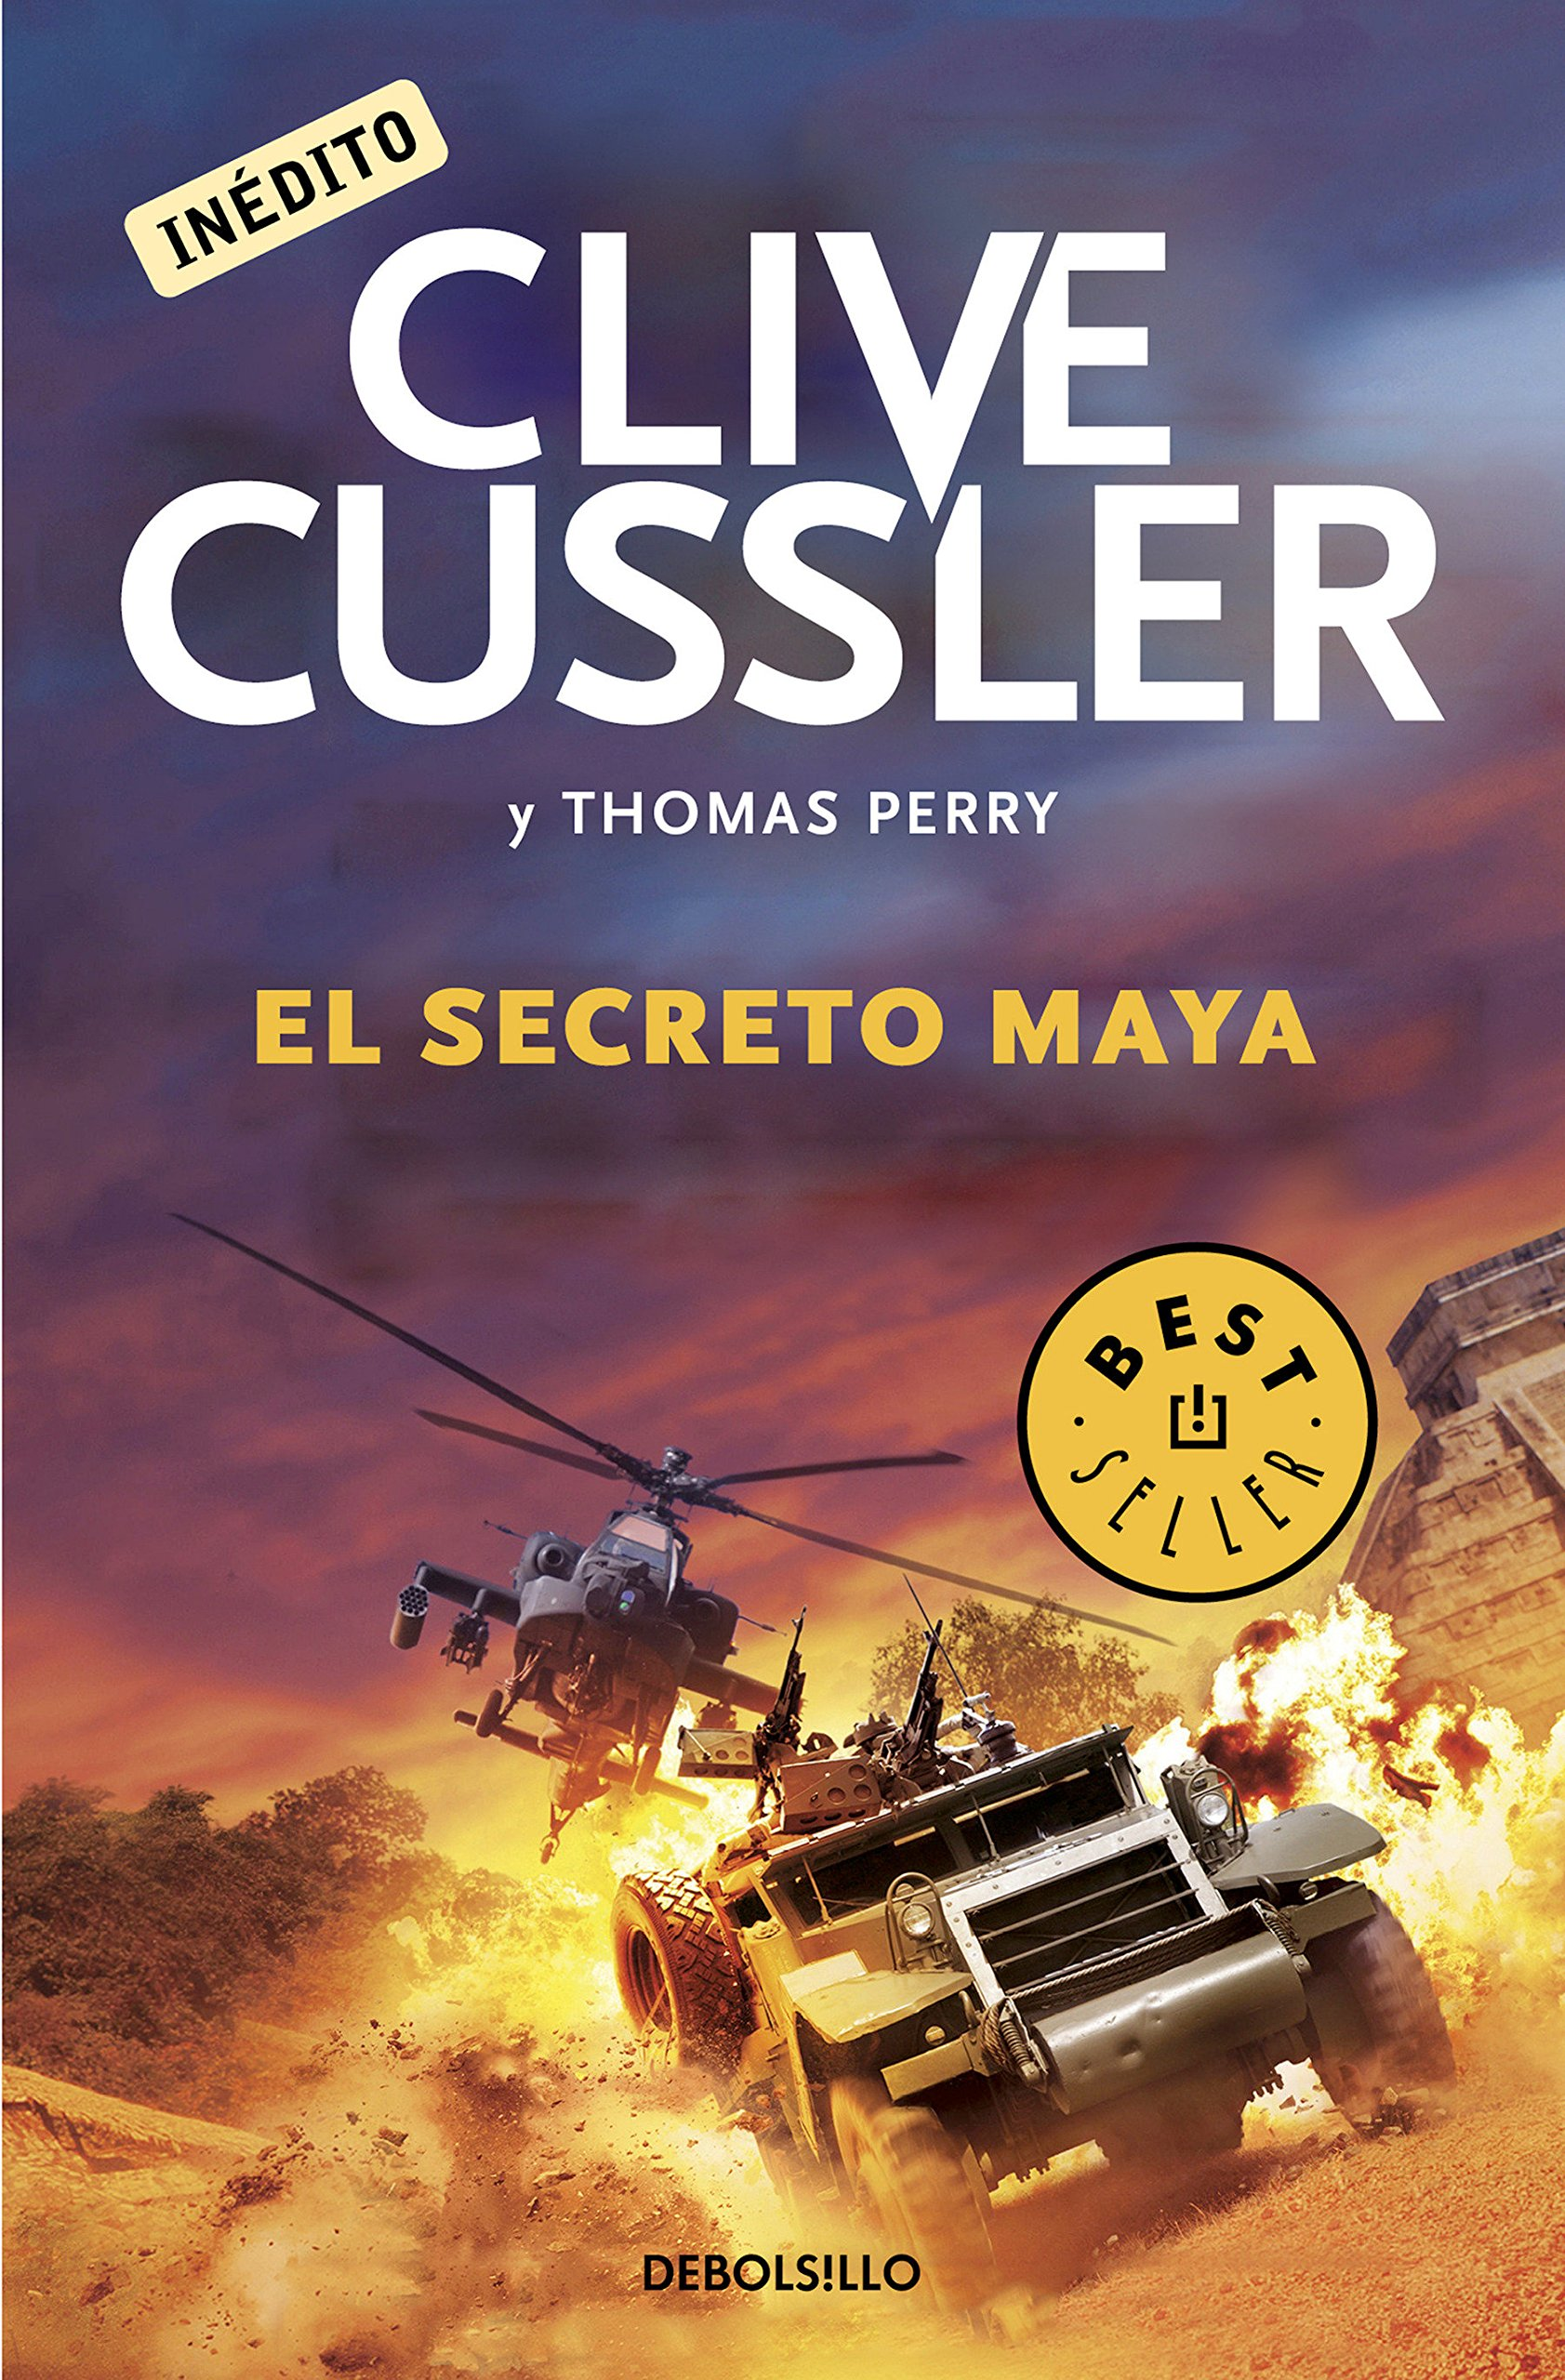 El secreto maya / The Mayan Secrets (Las aventuras de Fargo) (Spanish Edition) pdf epub